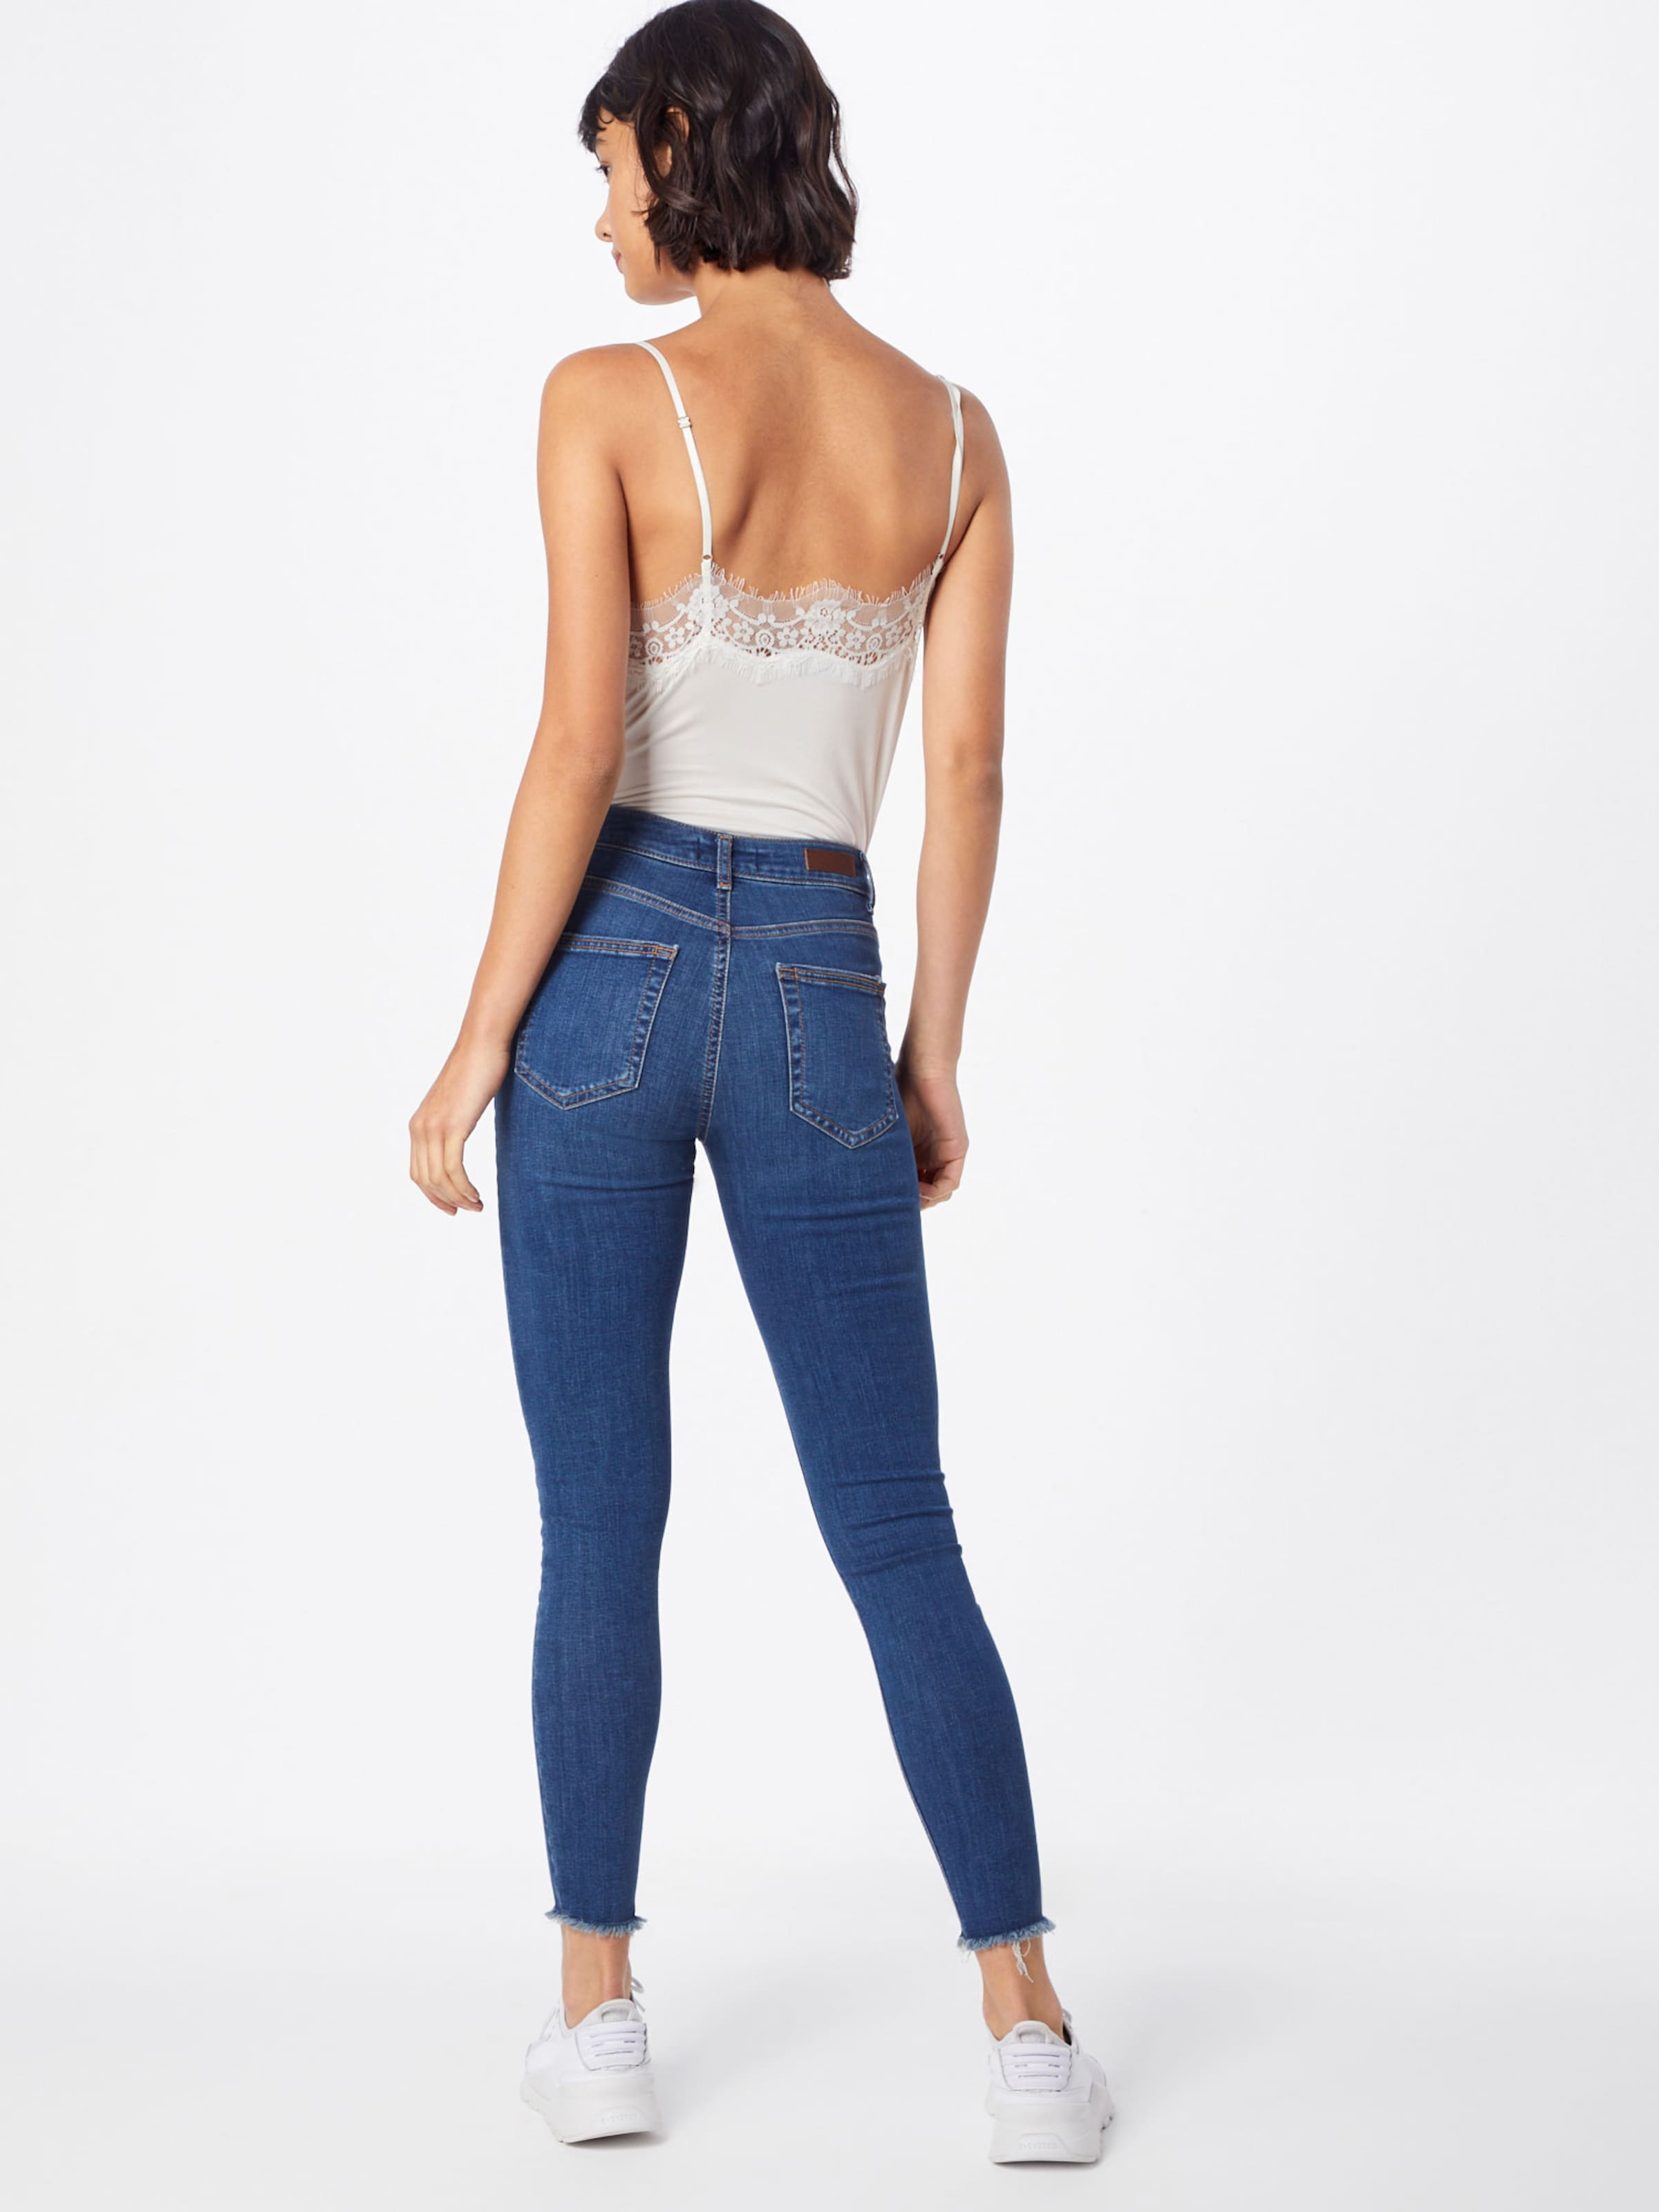 Pieces In Jeans Mb Skn Cr Blauw Noos' Denim B184 Mw 'pcdelly LSzjGqMpUV